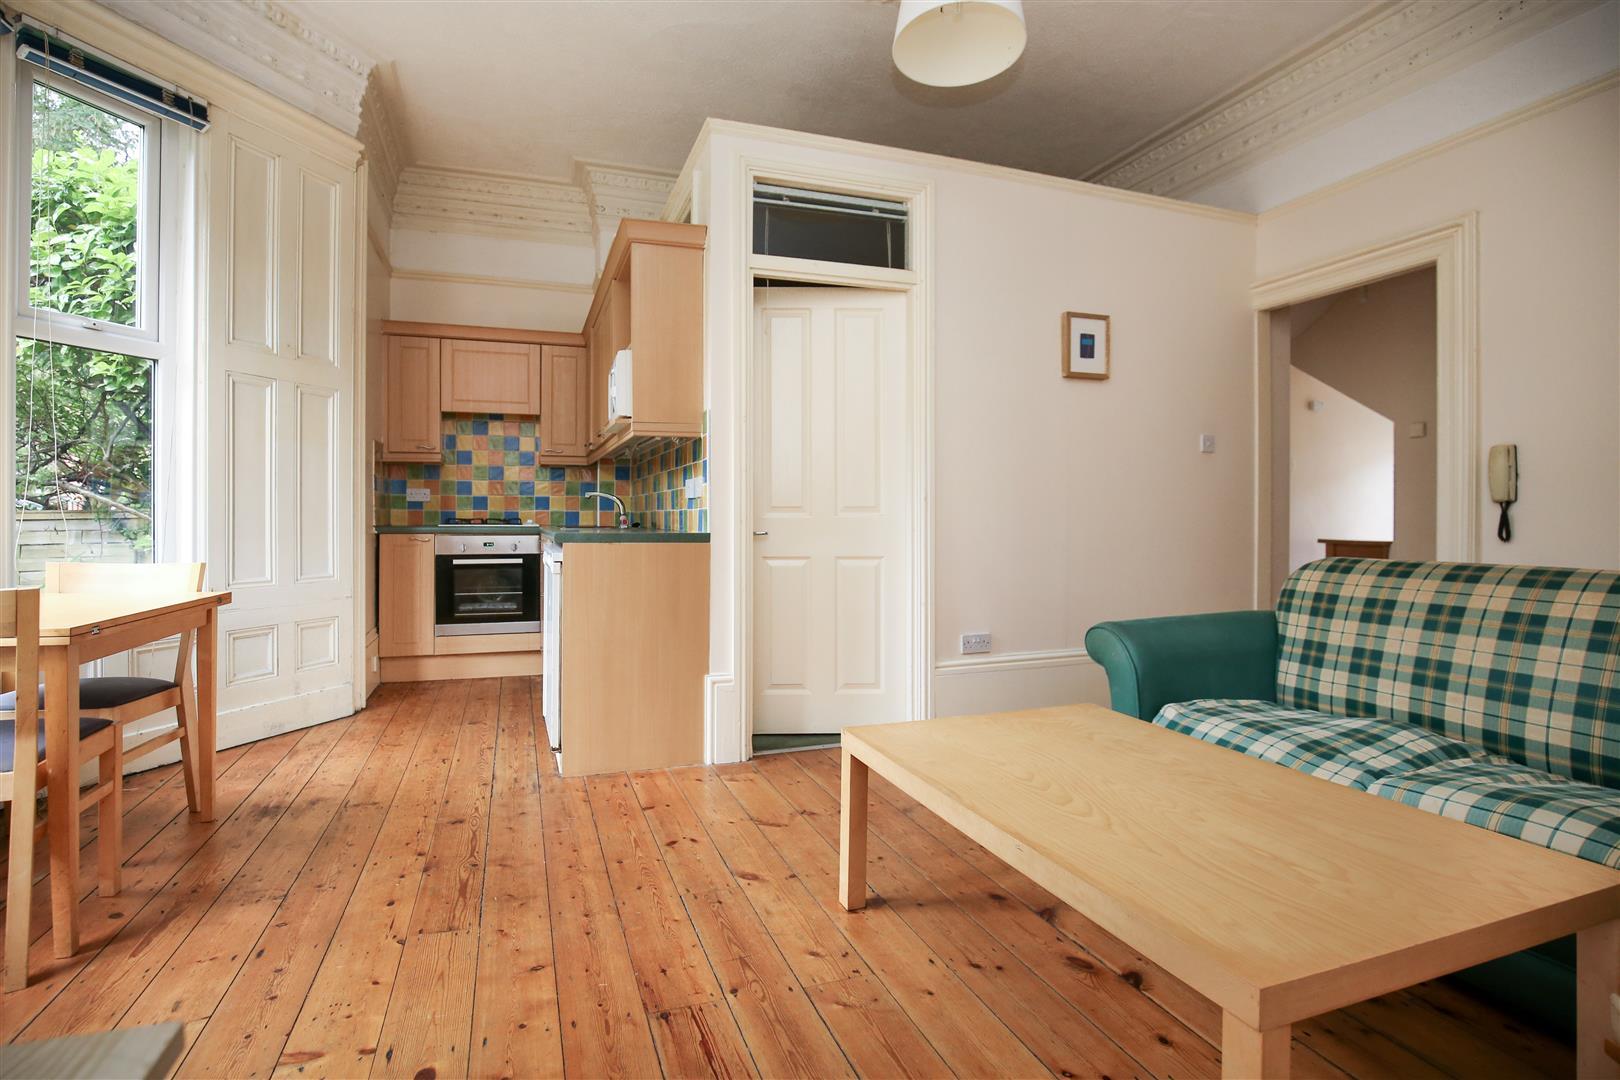 1 bed flat to rent in Newcastle Upon Tyne, NE2 3AP, NE2